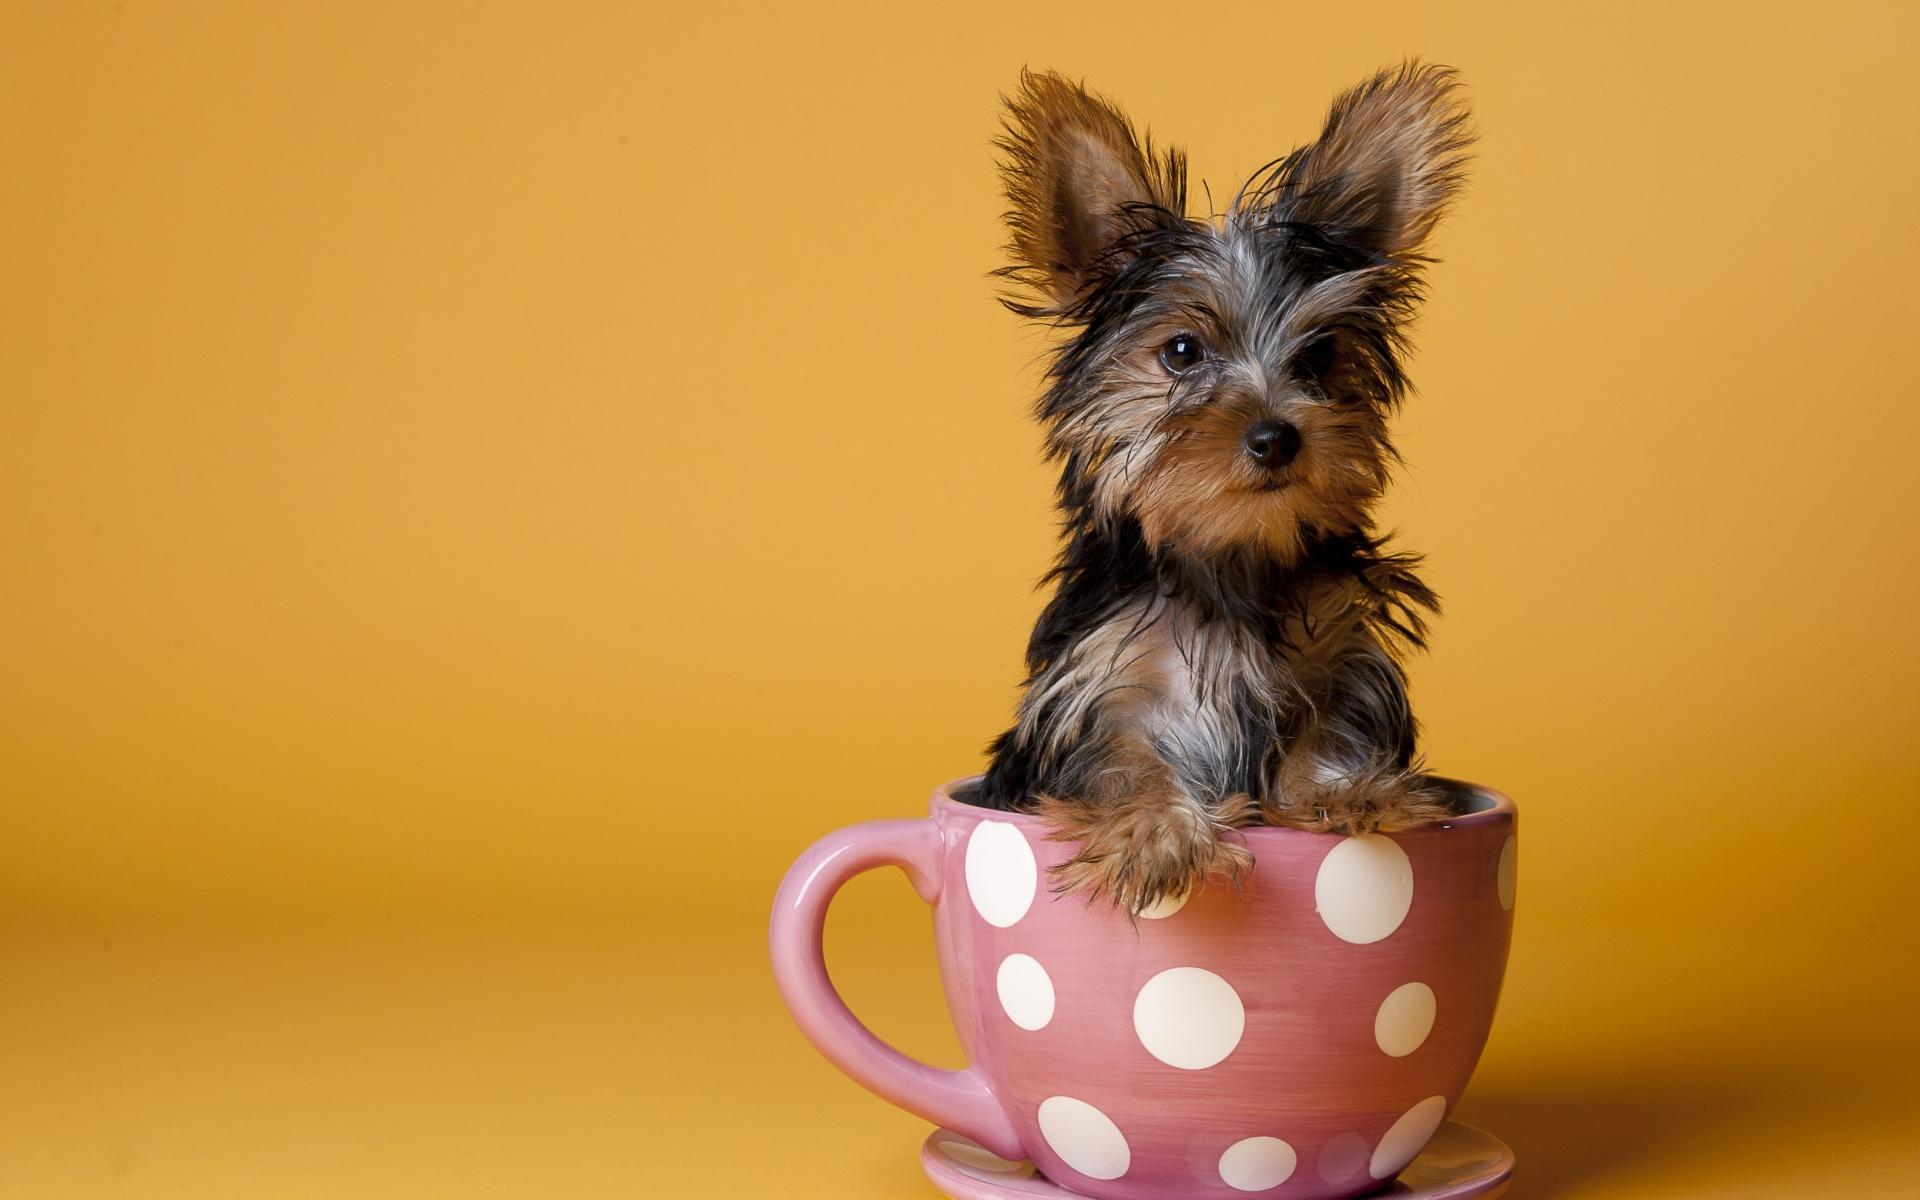 Fotos para fondo de pantalla de un yorkshire terrier